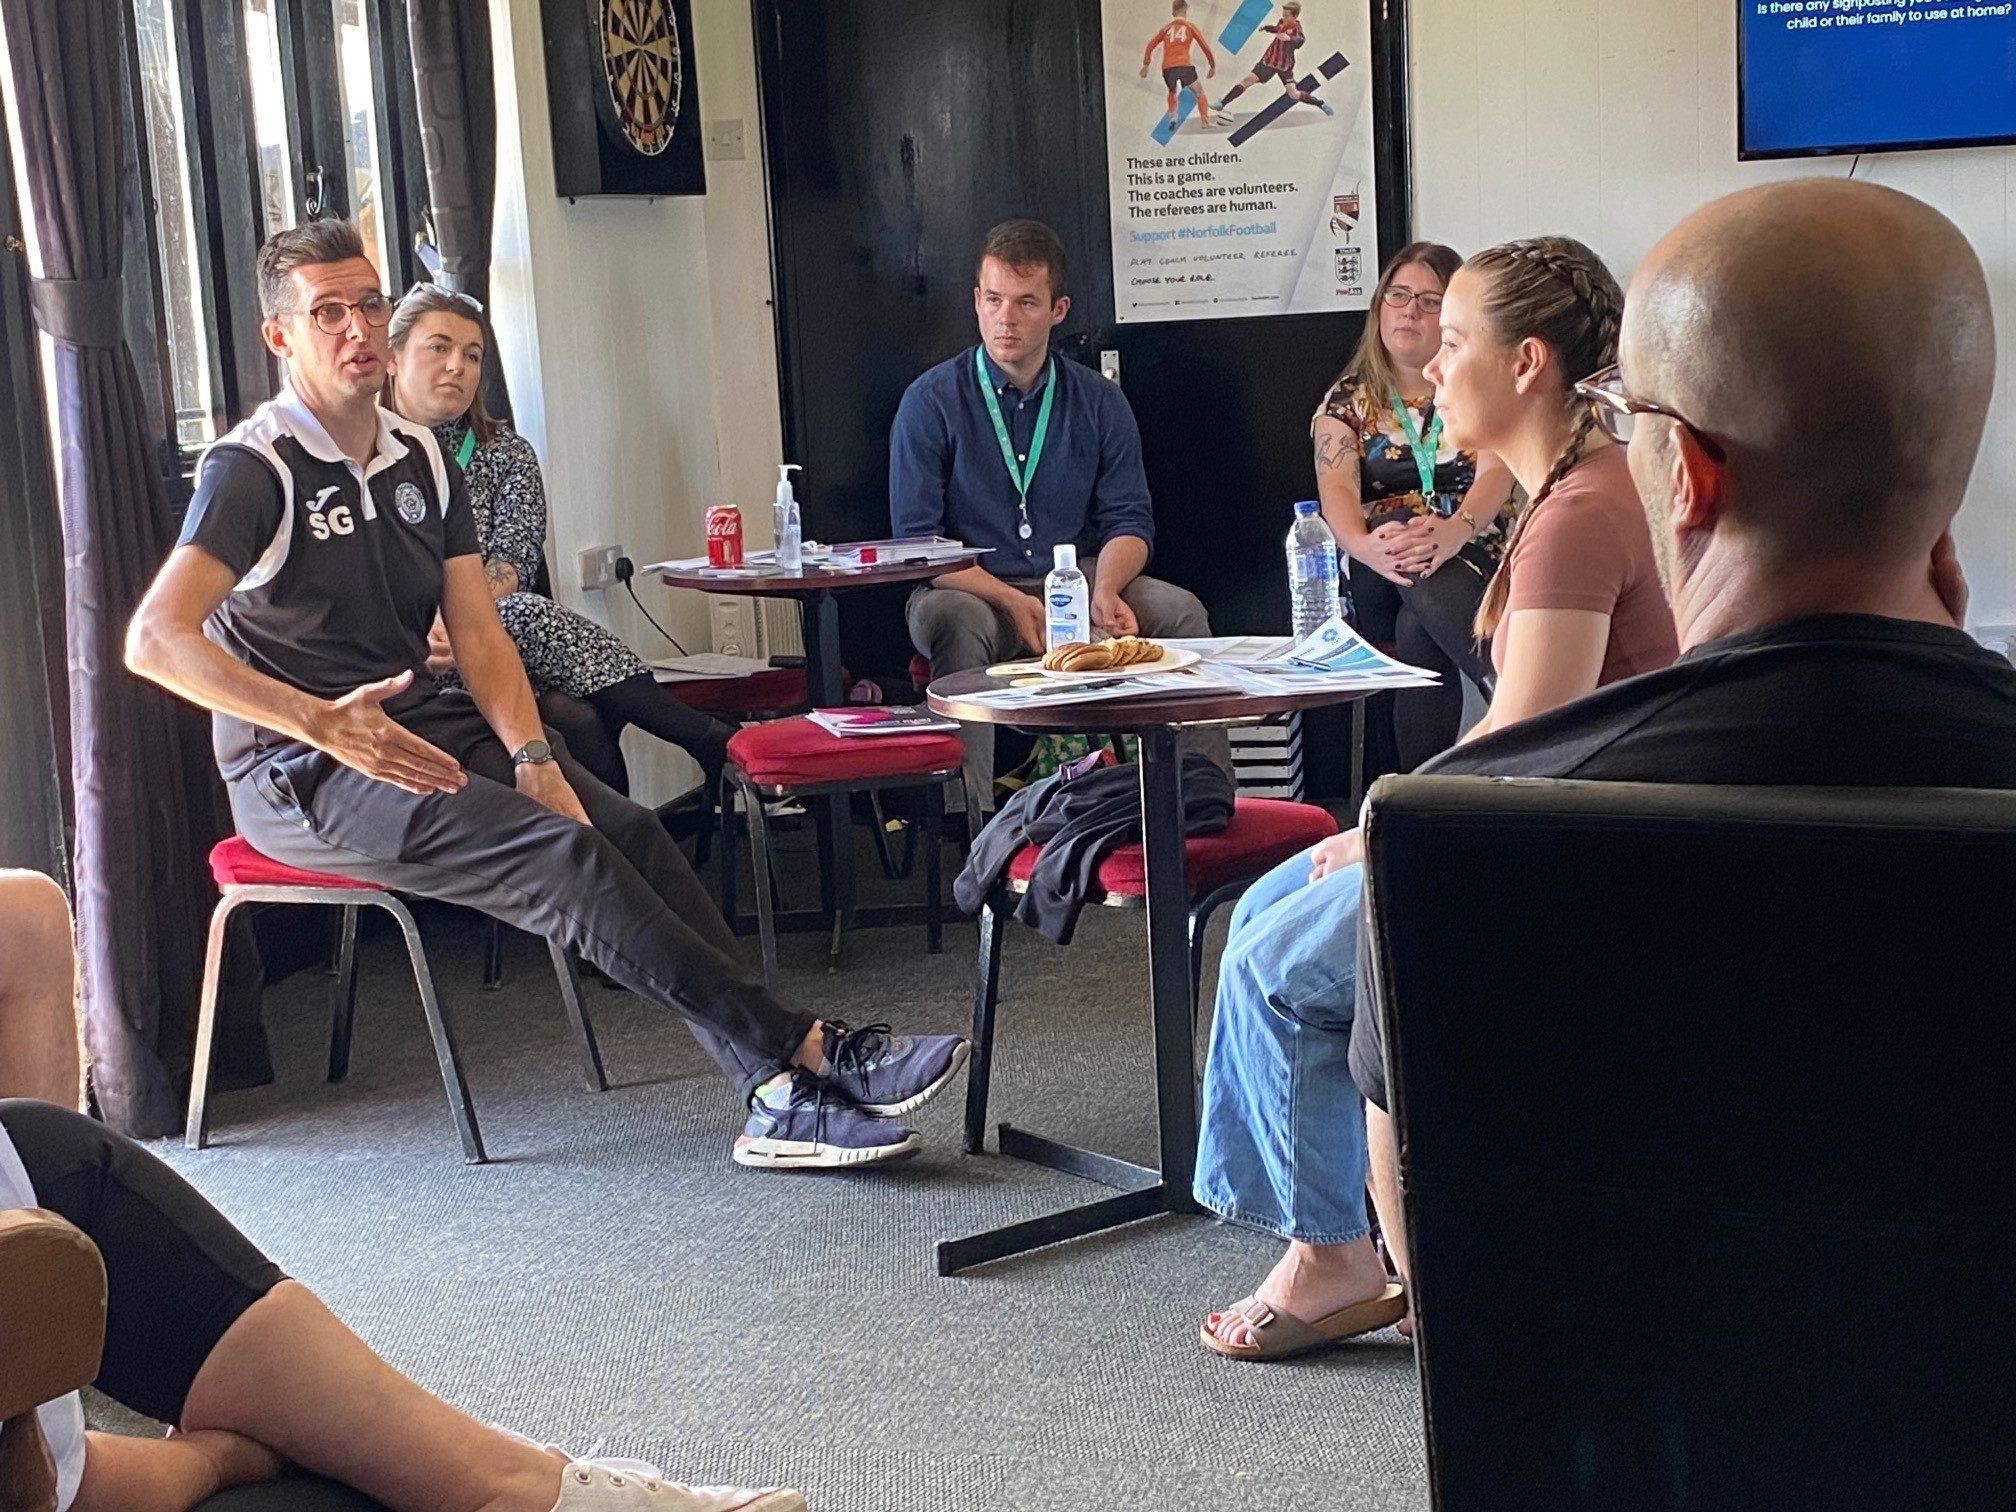 Staff discuss mental health at training